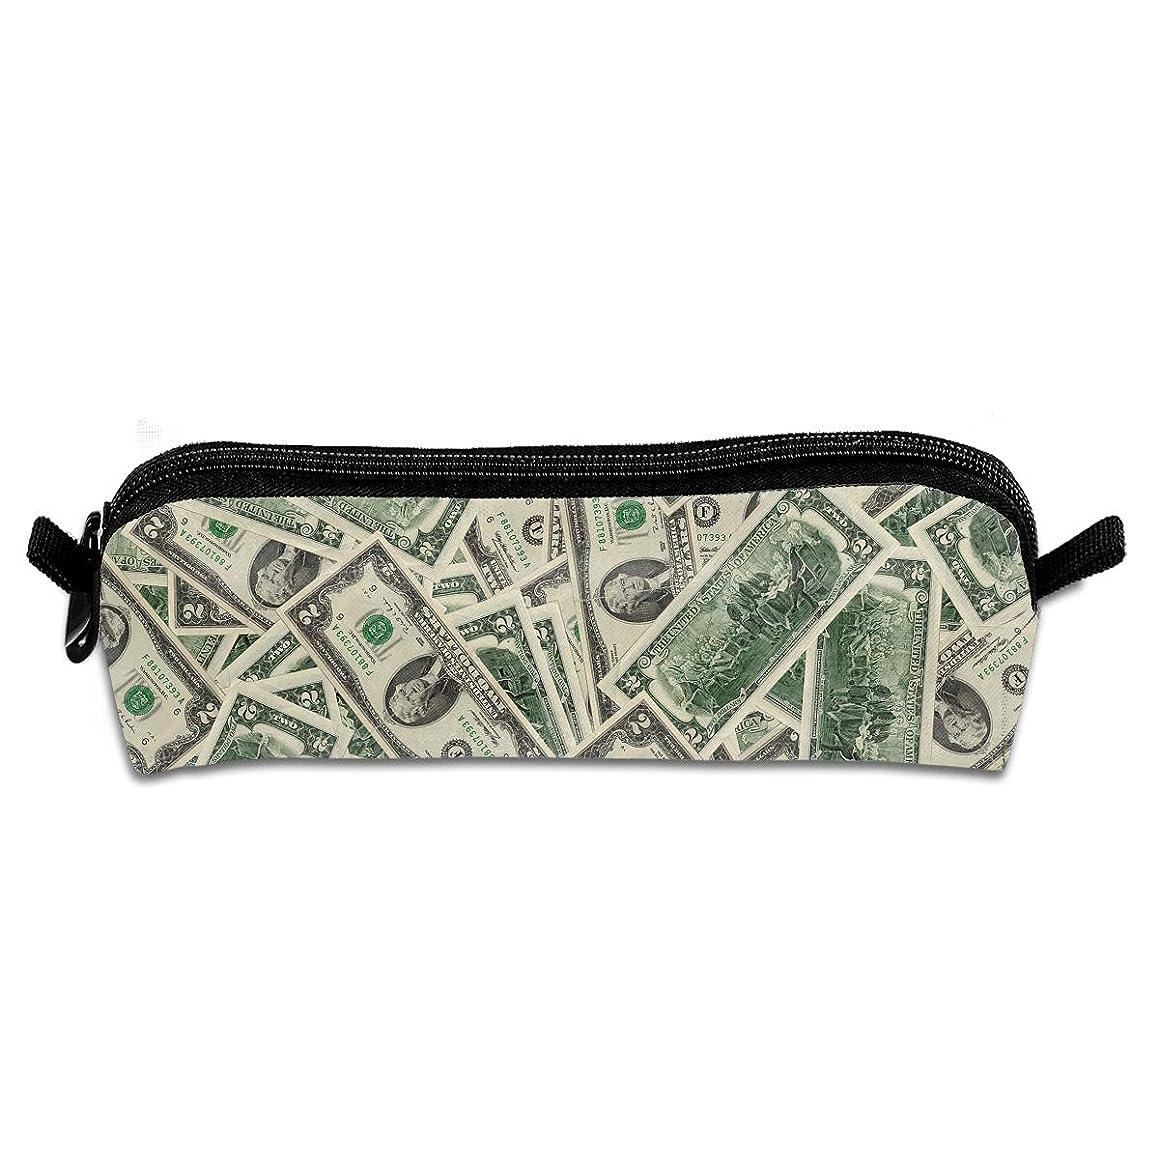 Diemeouk Pencil Case Dollar Money Paper Zippered Pen Bag Cosmetic Makeup Bags for Colored Watercolor Pencils